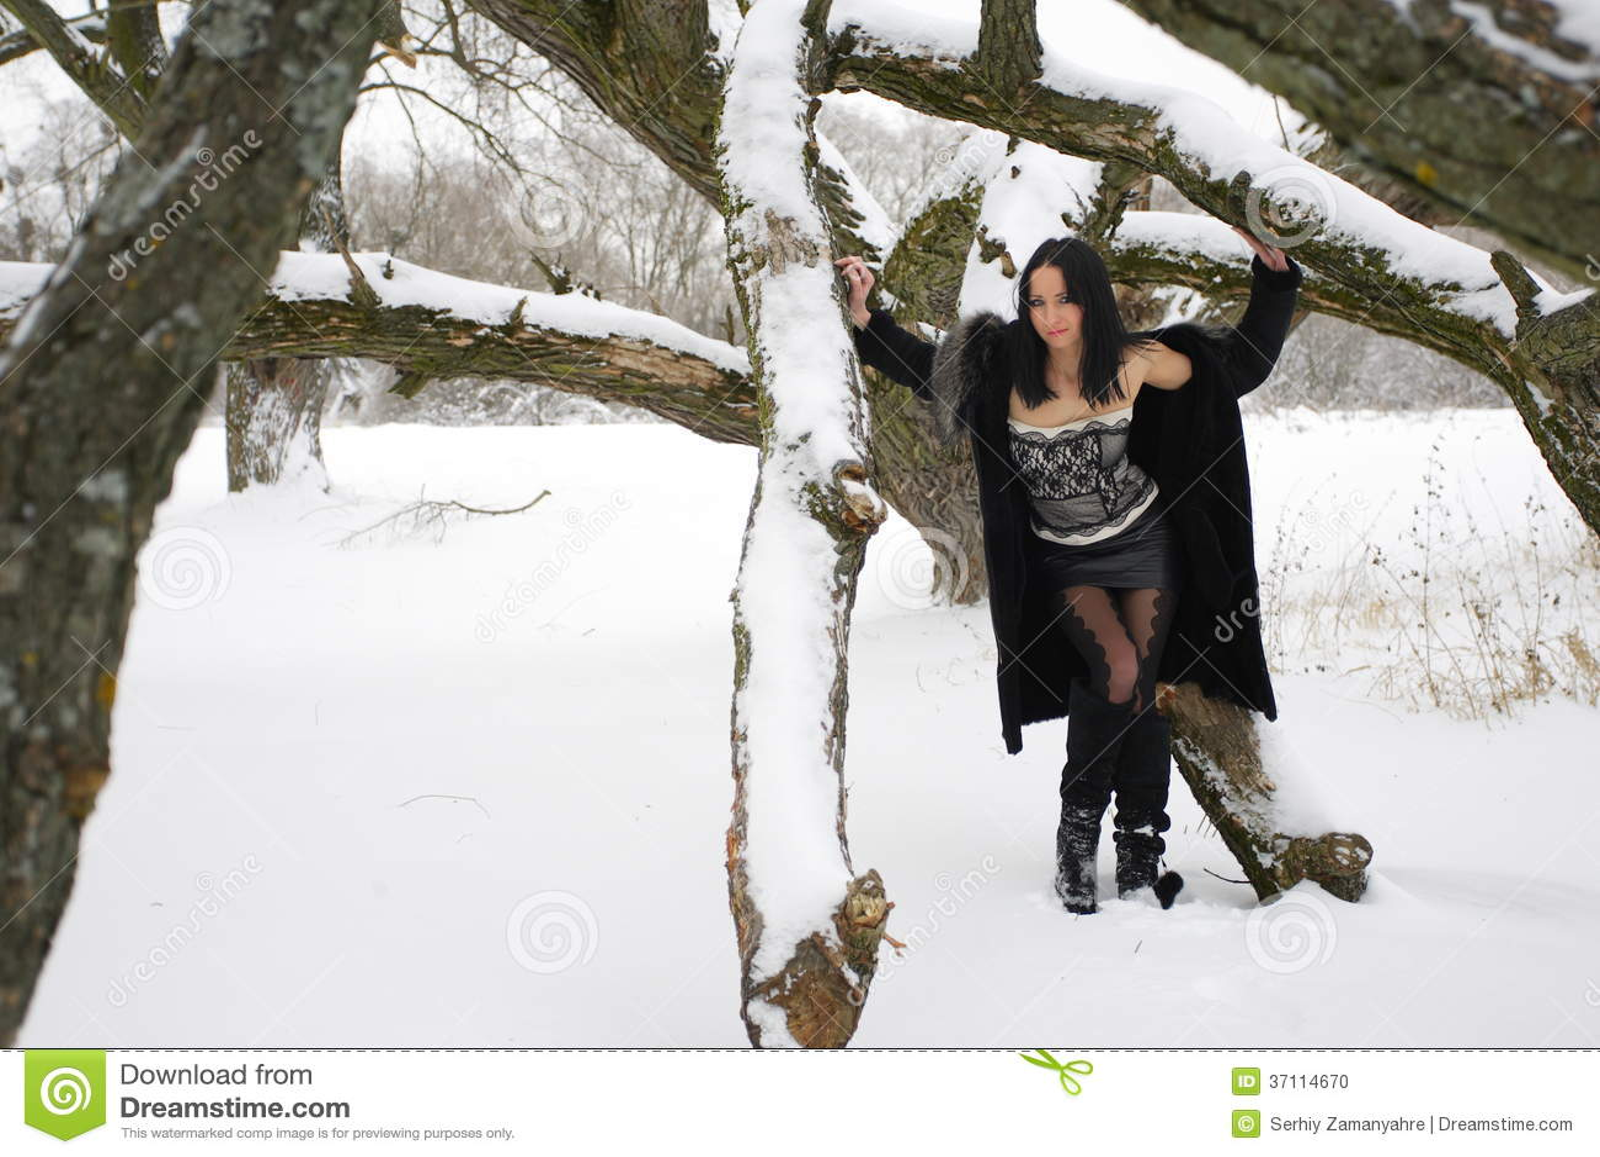 Nice Girl In The Snowy Landscape.winter Outdoor Scene